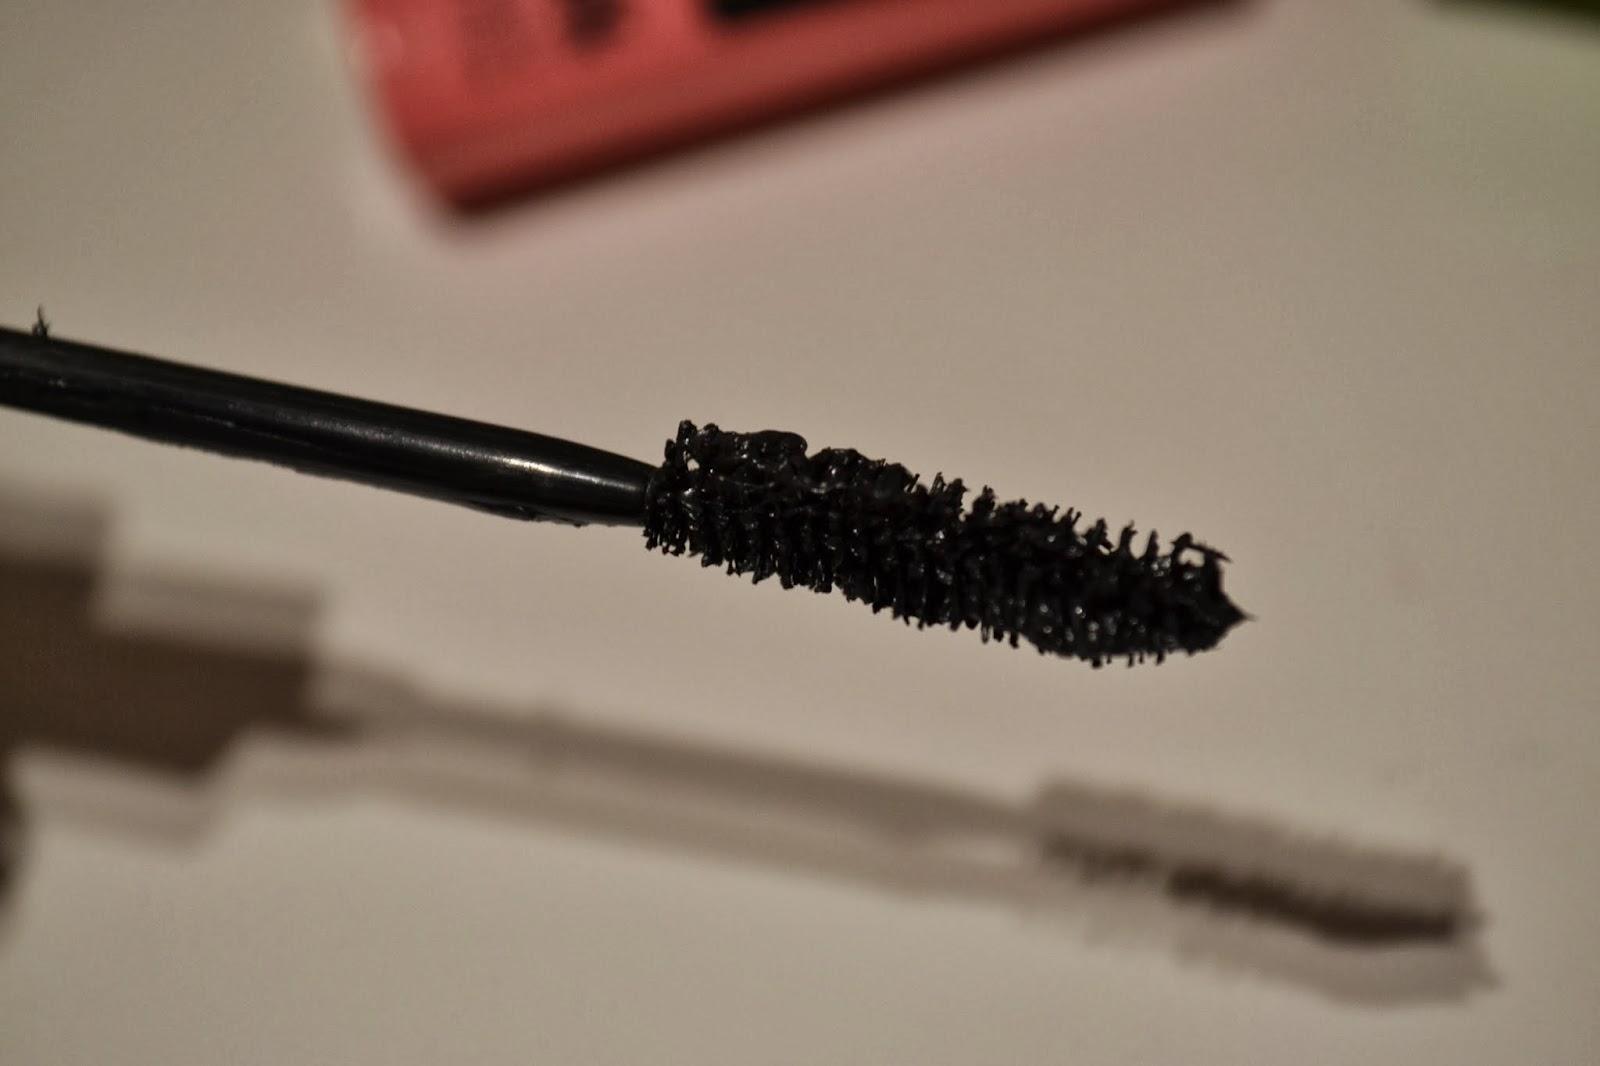 ysl-shocking-mascara-wand